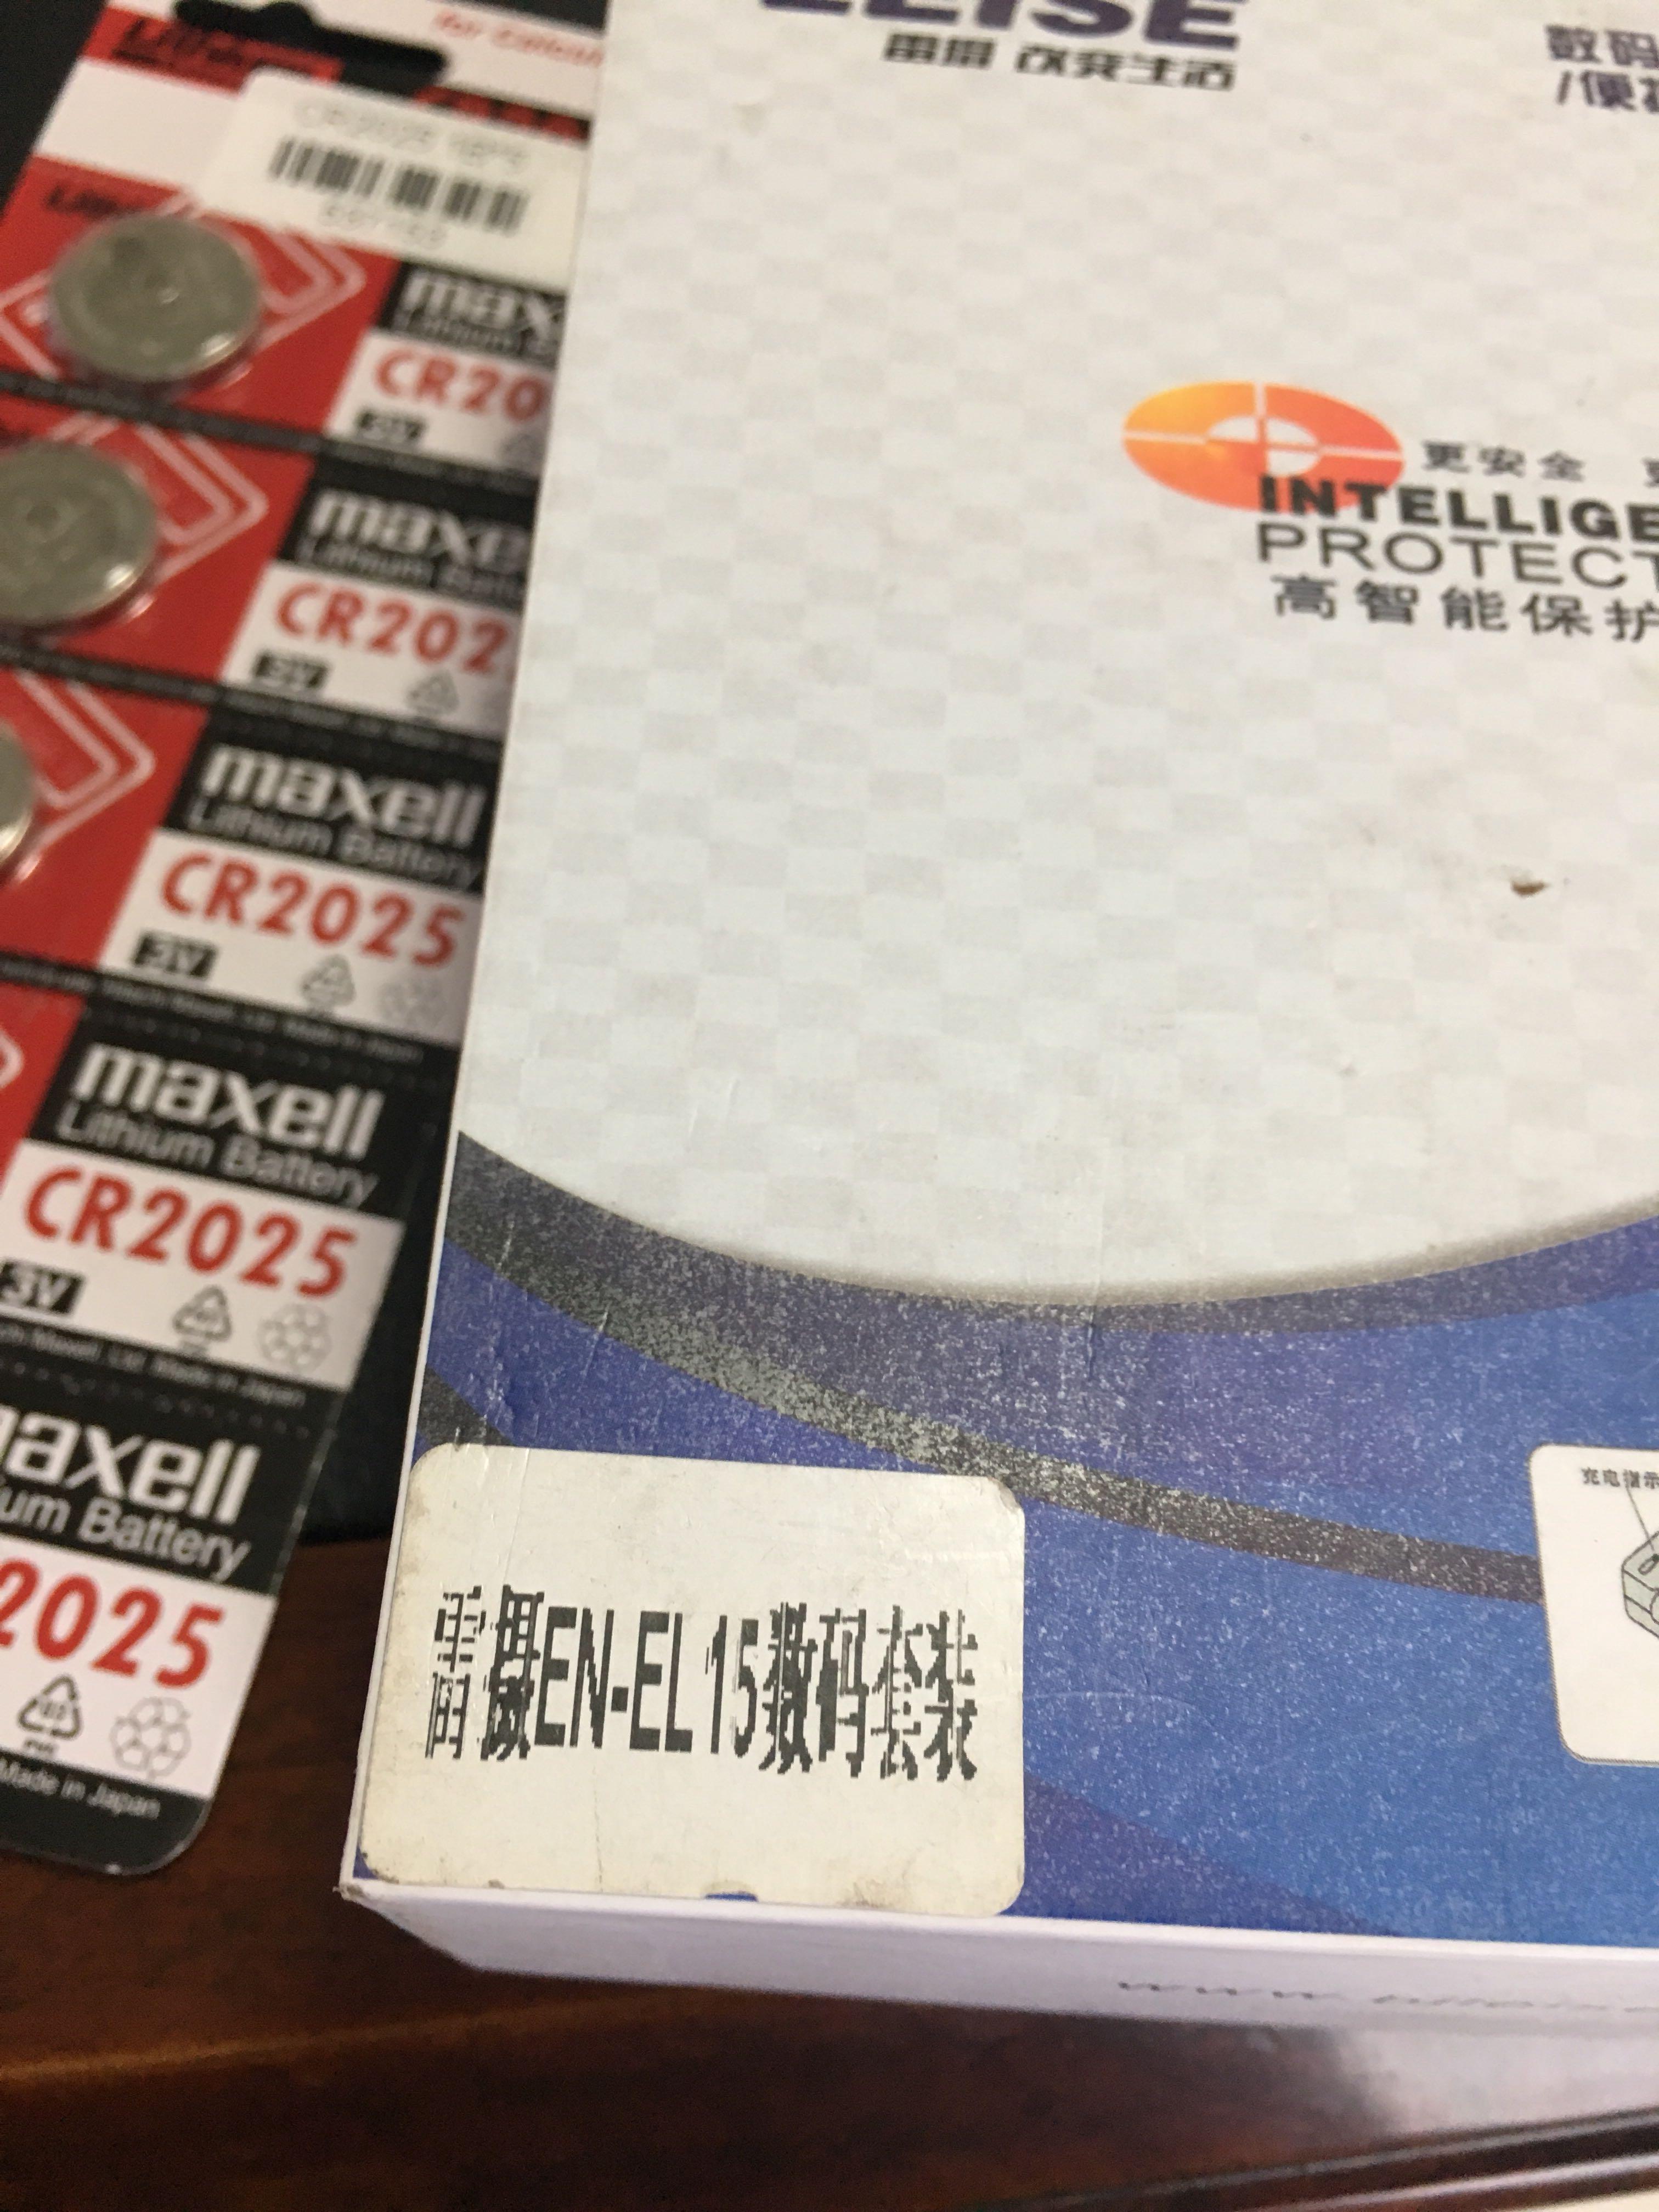 footwear online shopping websites reviews 00286208 outletonlineshop